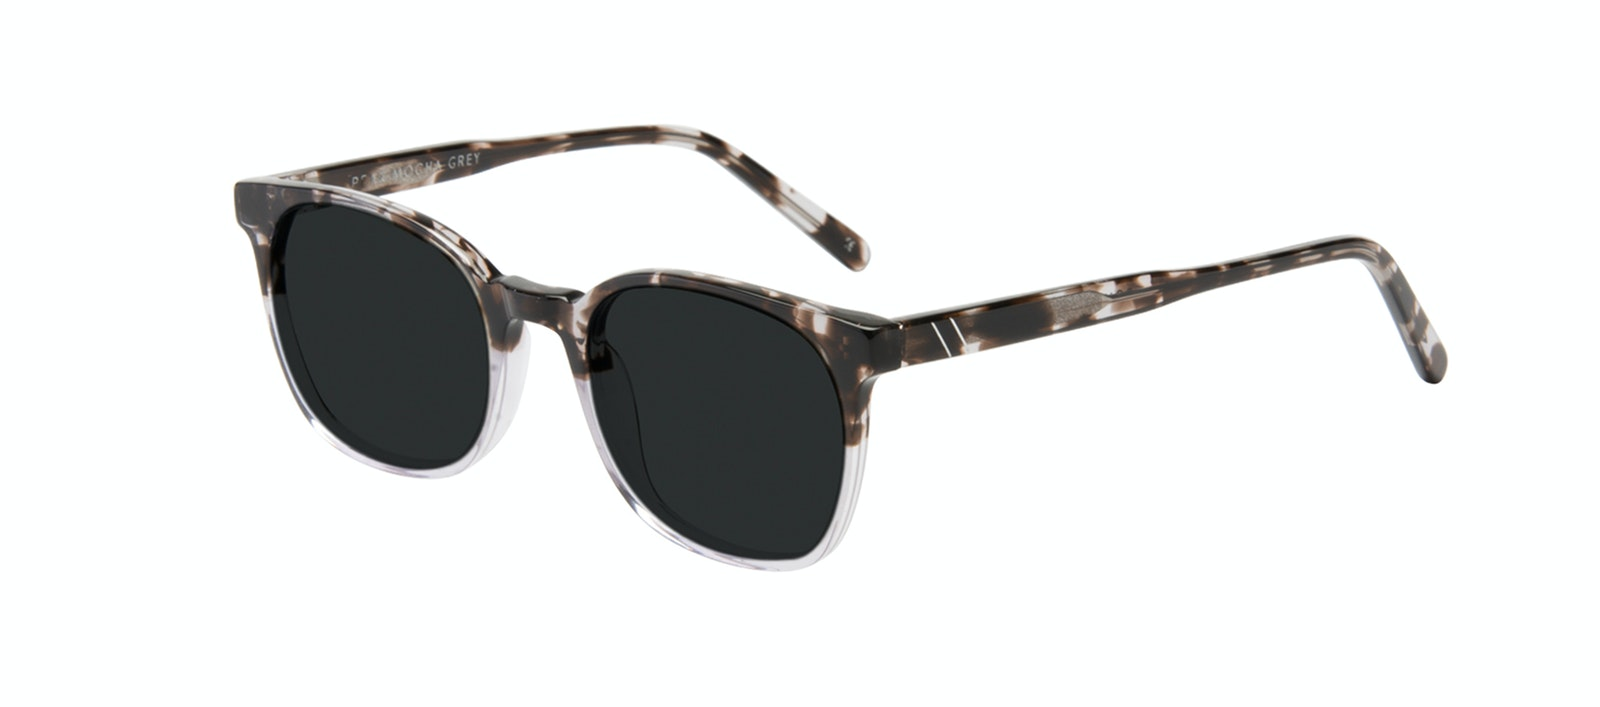 Affordable Fashion Glasses Rectangle Square Sunglasses Men Peak Mocha Grey Tilt